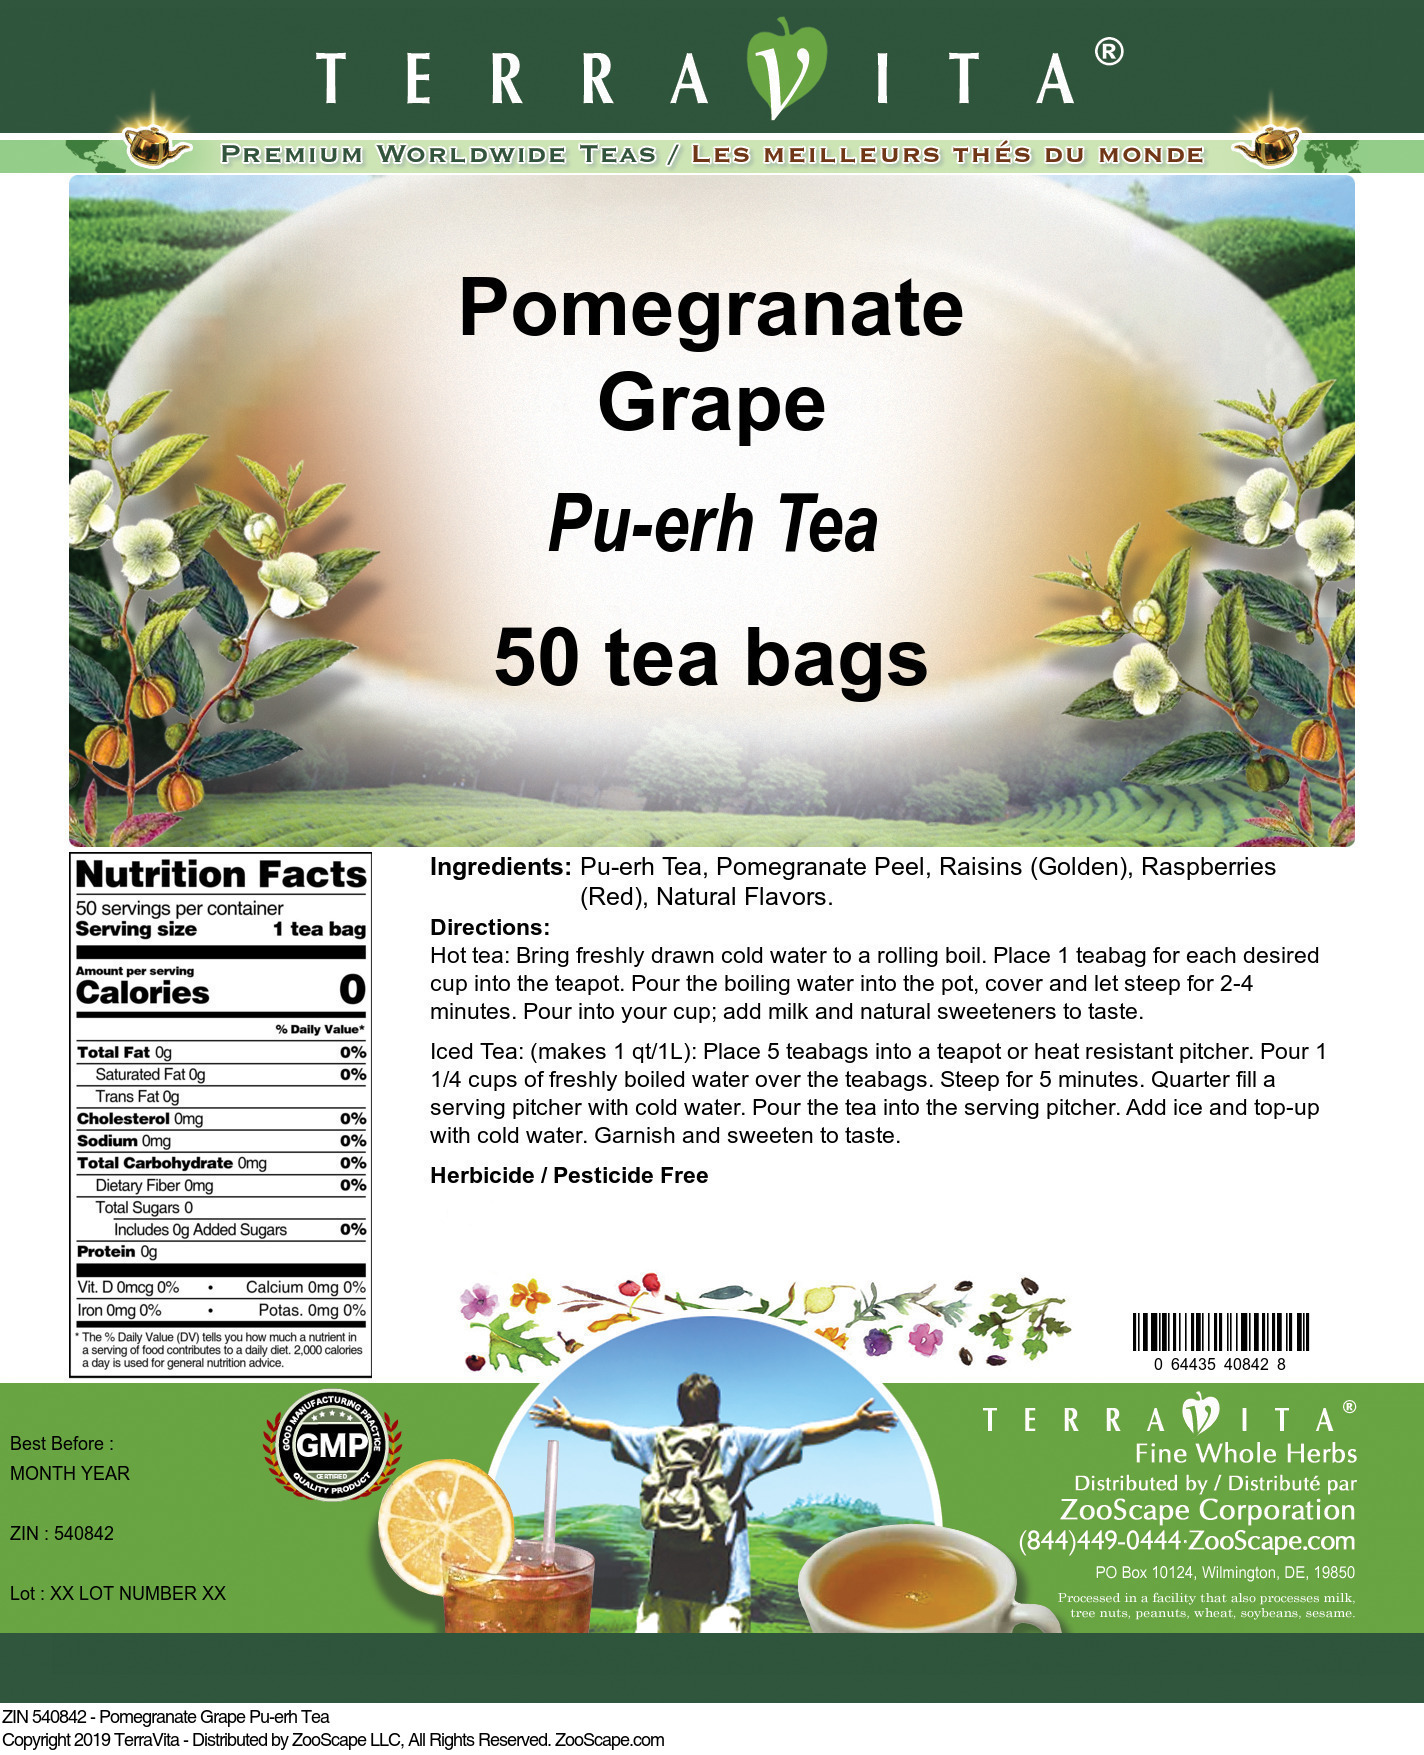 Pomegranate Grape Pu-erh Tea